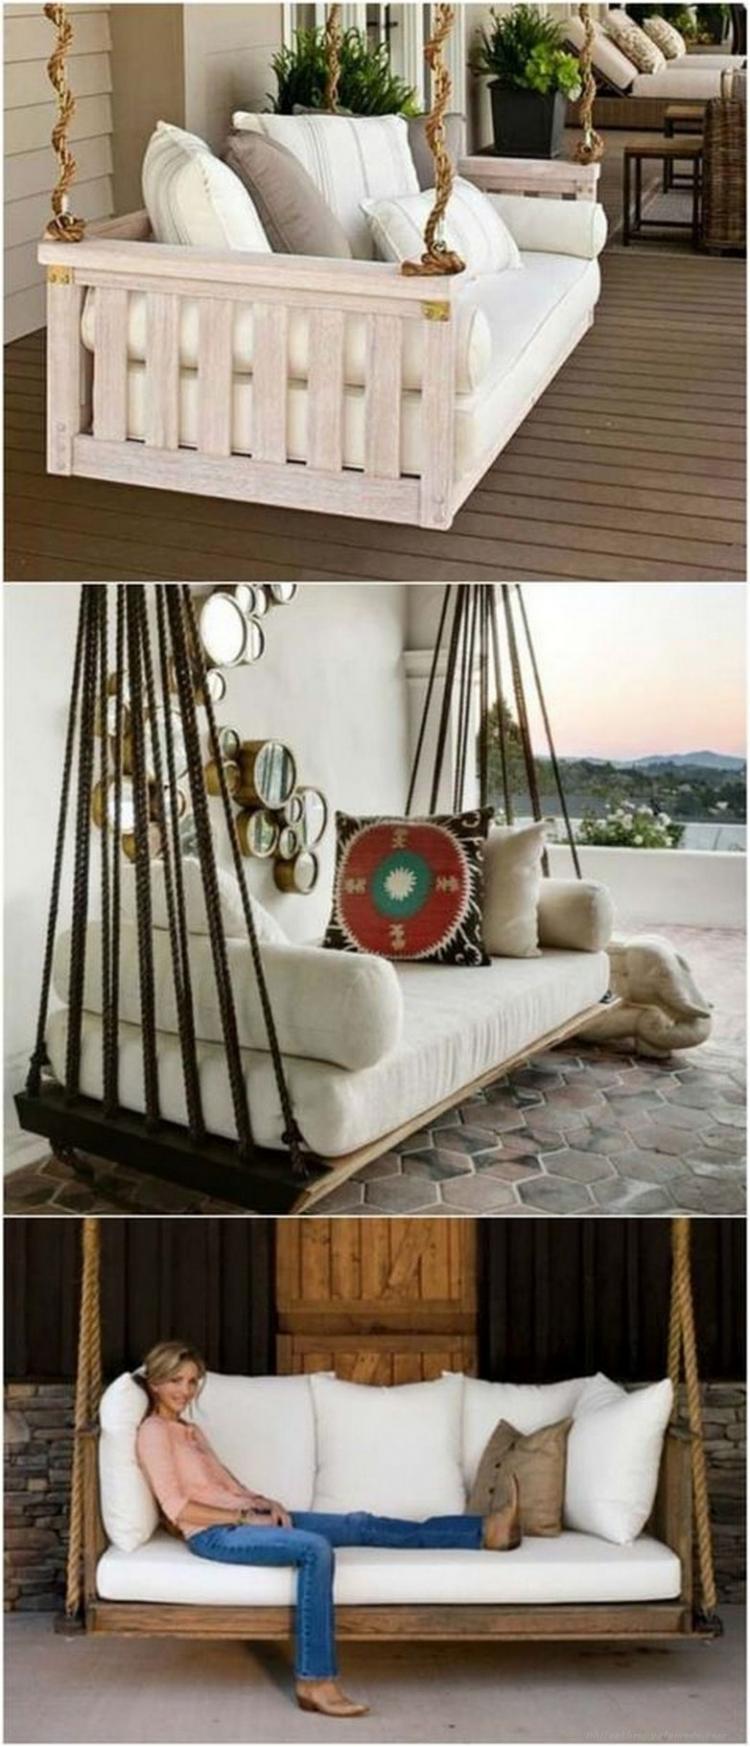 BEST DIY FURNITURE DESIGN IDEAS